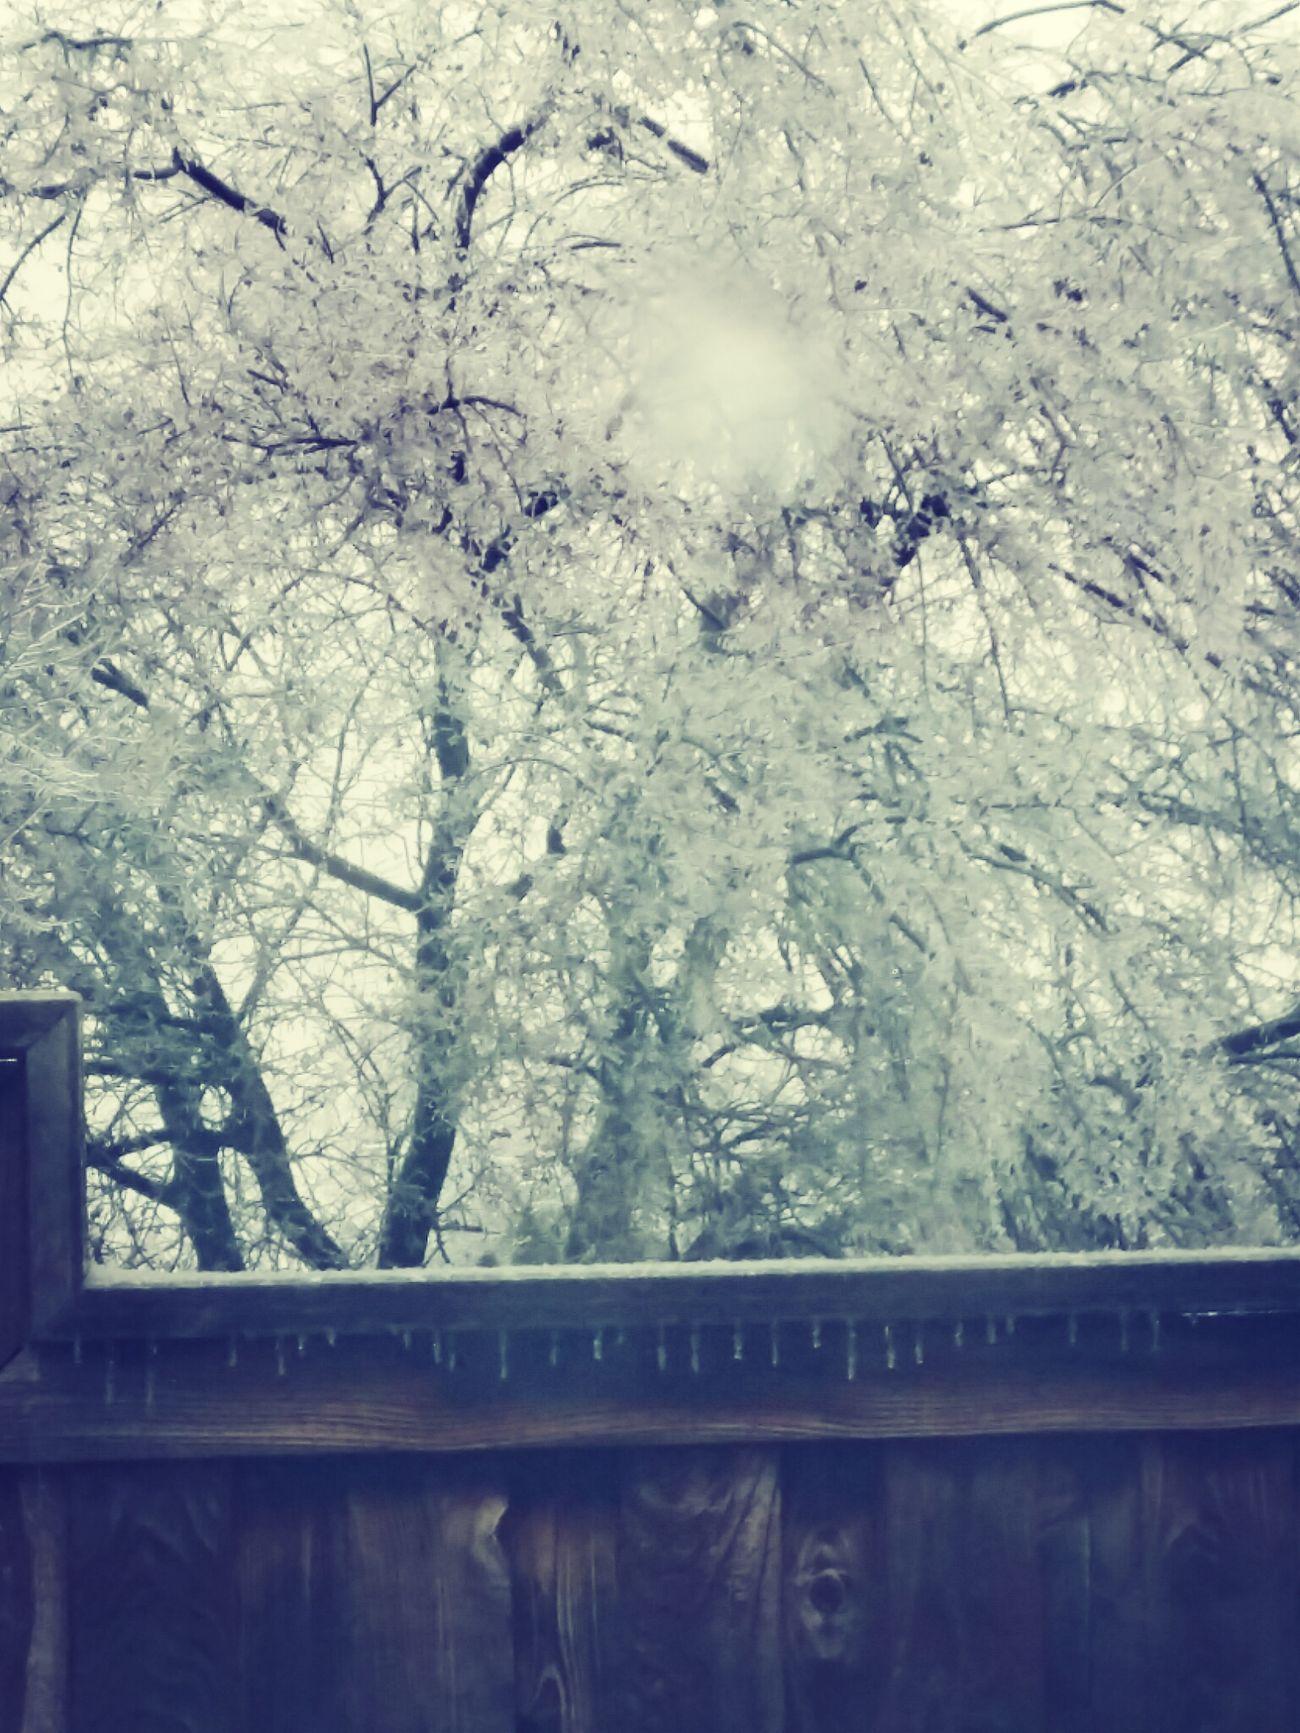 árboles cristalizados se ven hermosos ♧